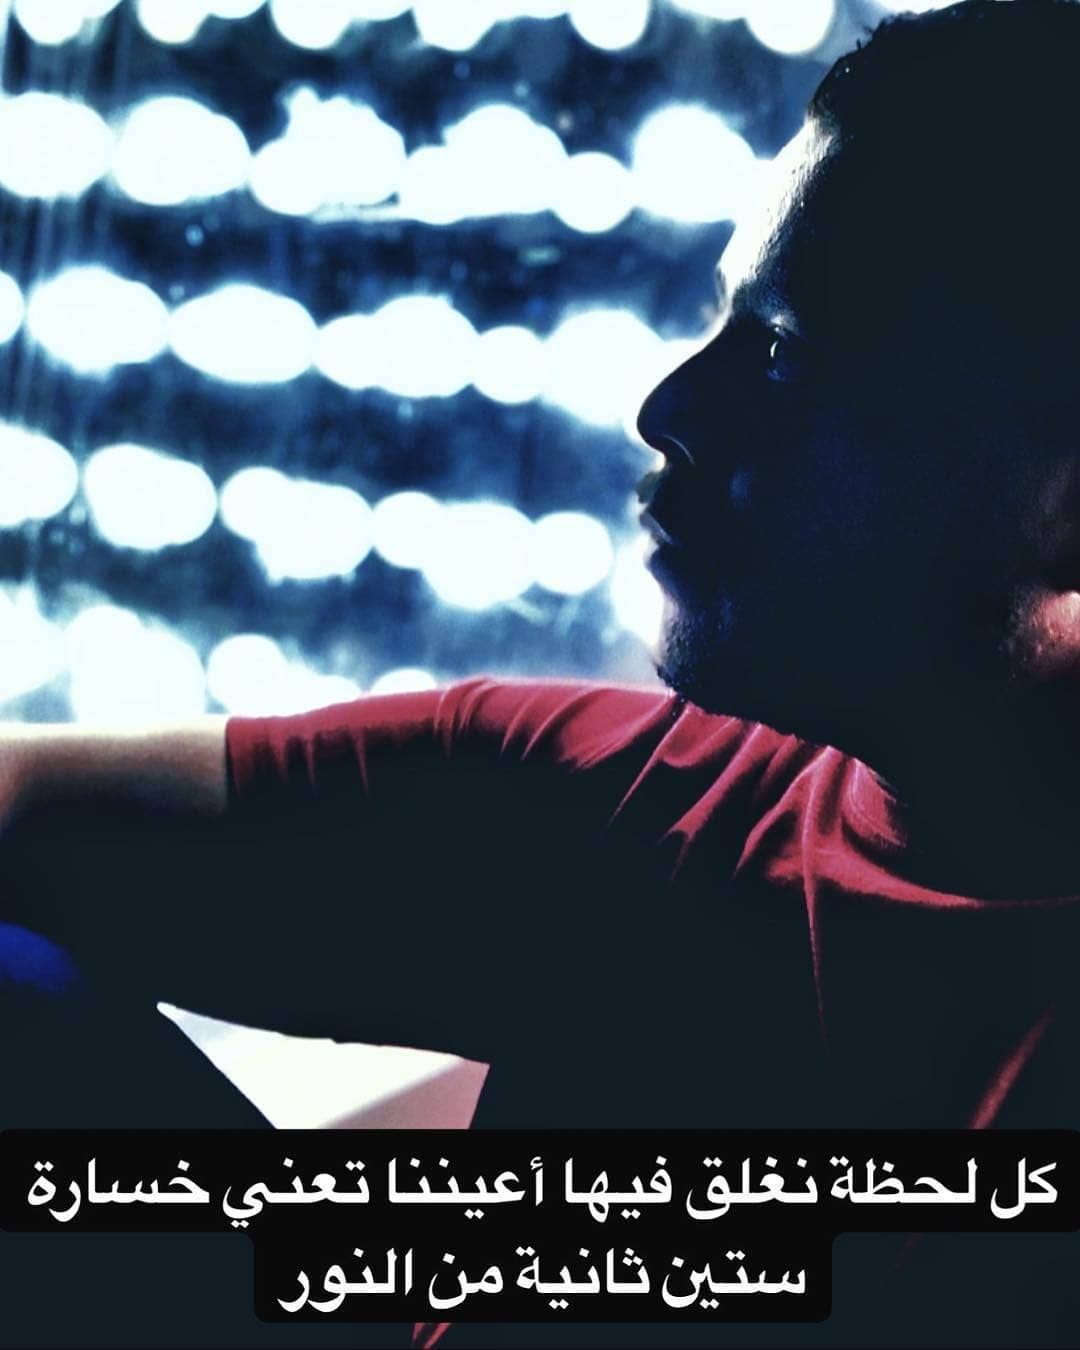 عبارات النور كلمات دبي نصيحة دبي مول تصوير تصميم تصاميم Kuwait Dubailife Cosplay نثر عبارة مصمم خاطرات خاطره Like Movie Posters Movies Poster